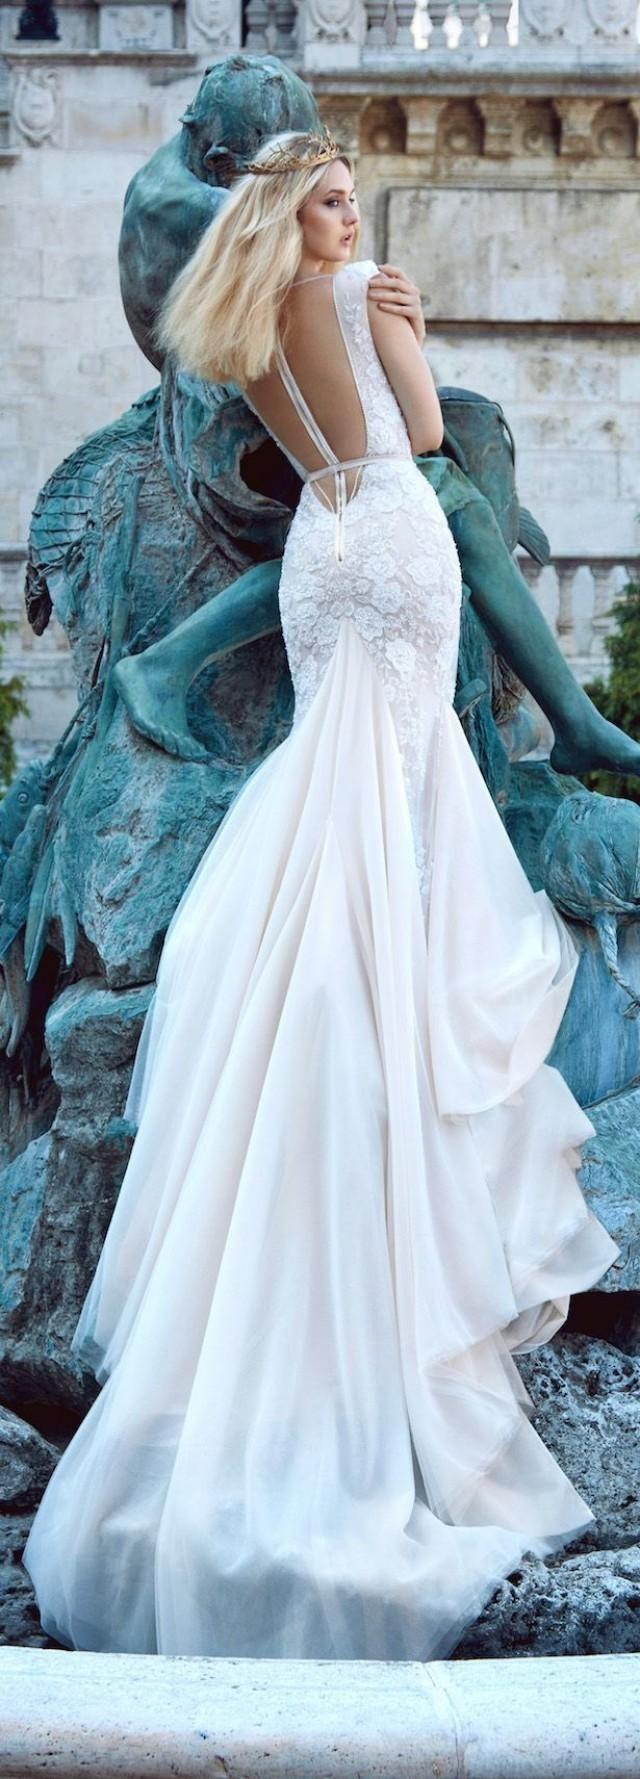 Yellow wedding decorations ideas november 2018  best Dream images on Pinterest